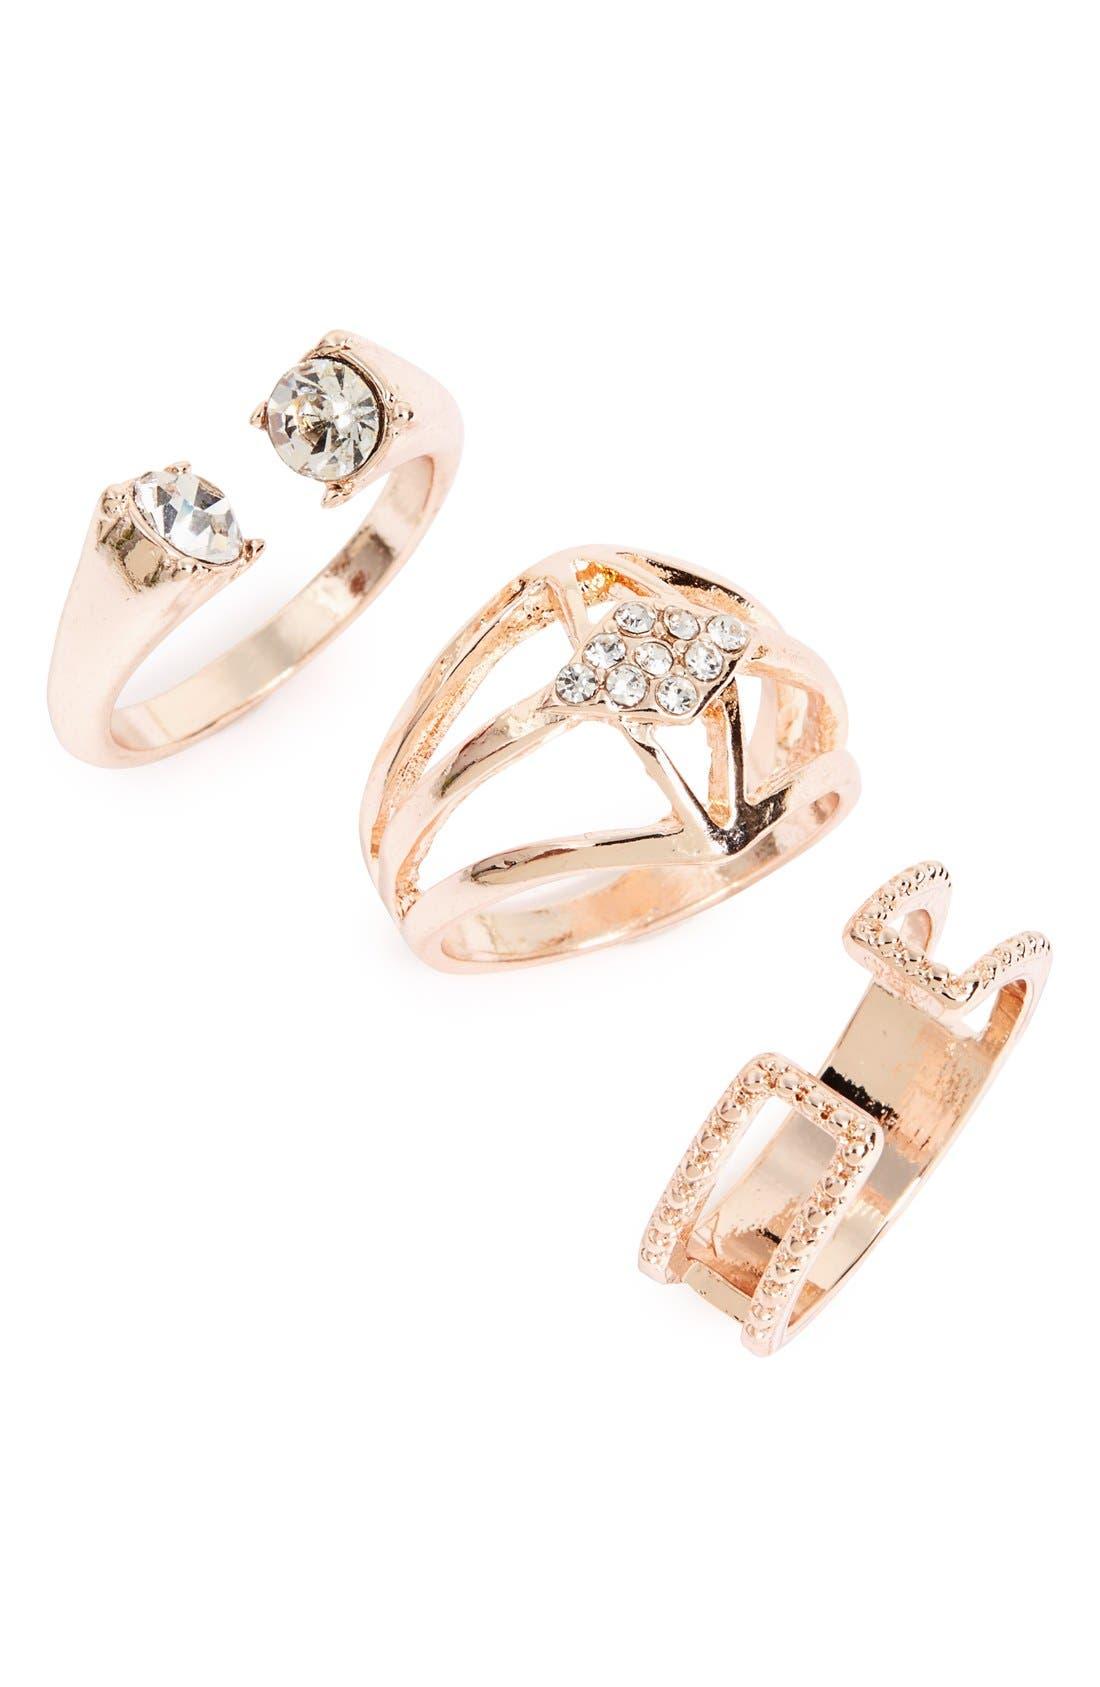 Alternate Image 1 Selected - Topshop 'Crystal Shield' Rings (Set of 3)